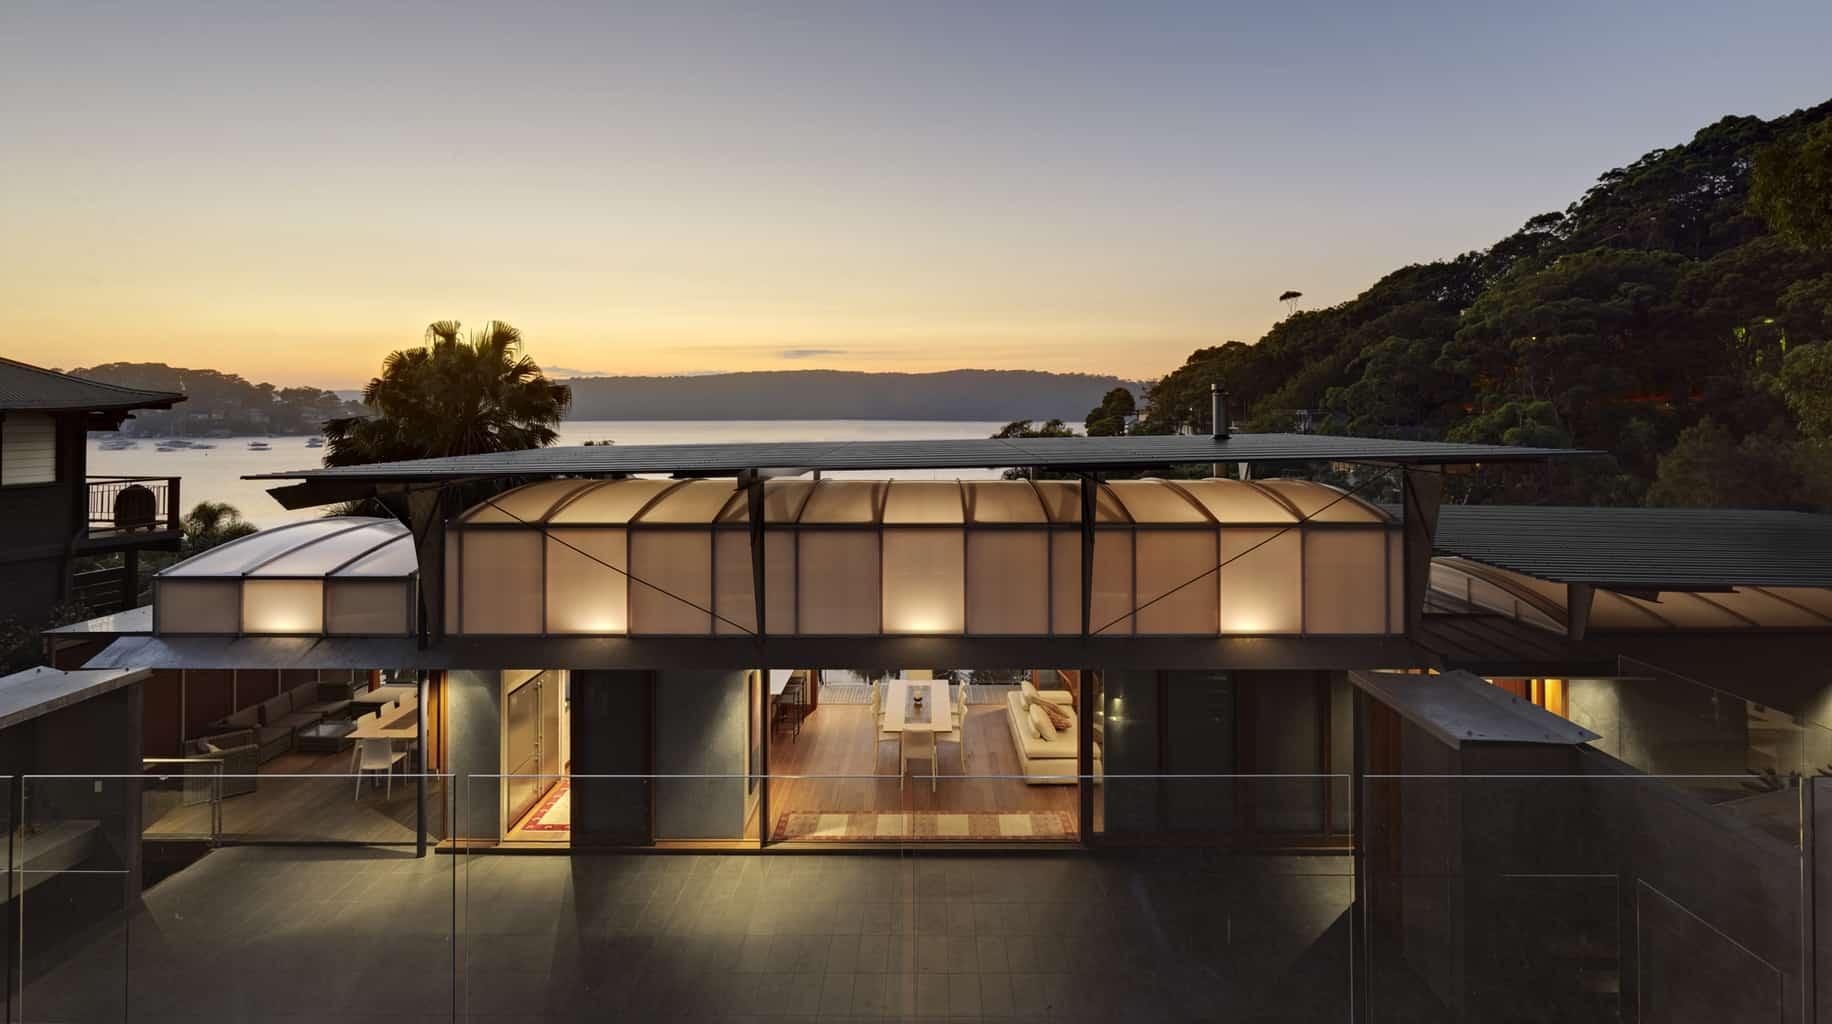 2012 House Awards: Cliff face house